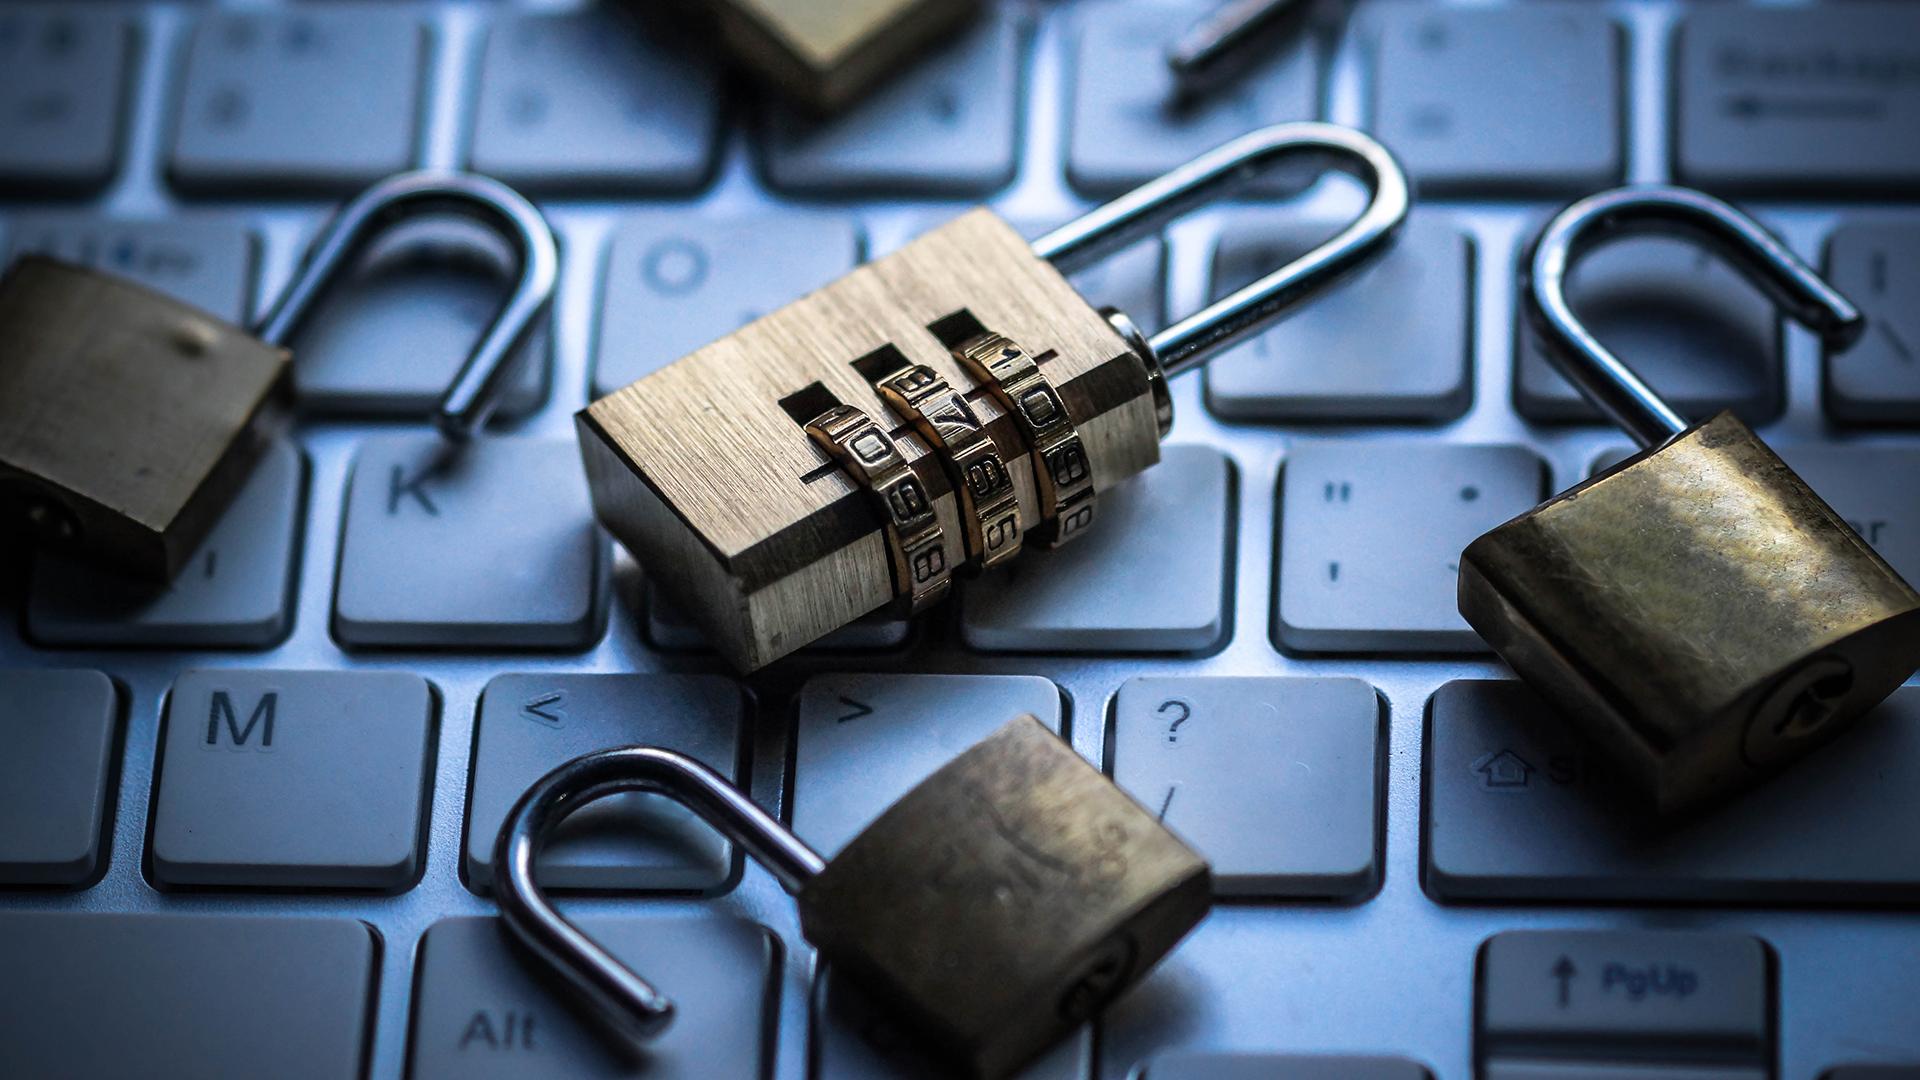 locks on keyboard